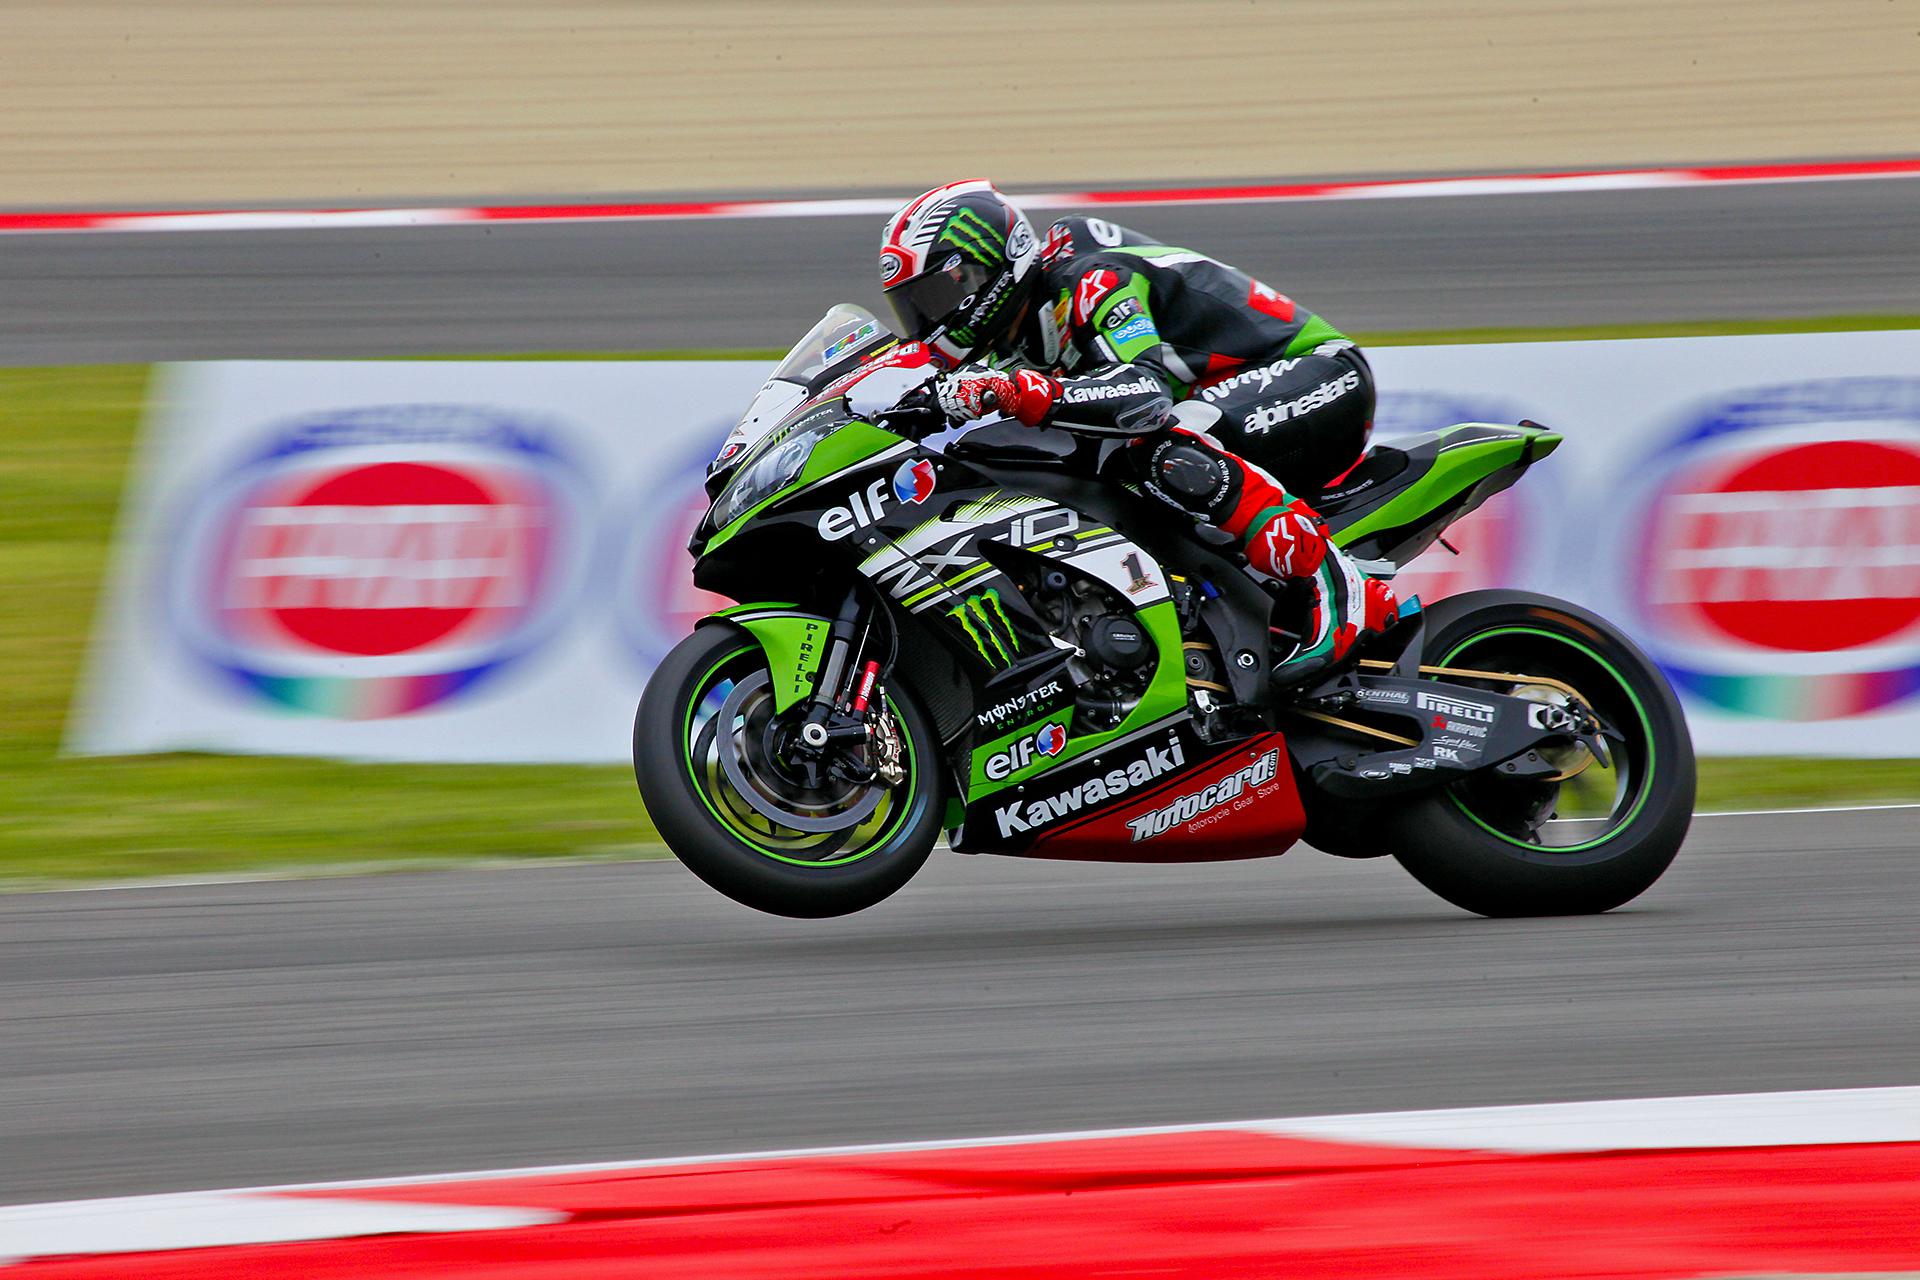 Jonathan Rea. Kawasaki Factory Racing.Superbike Corld Championship